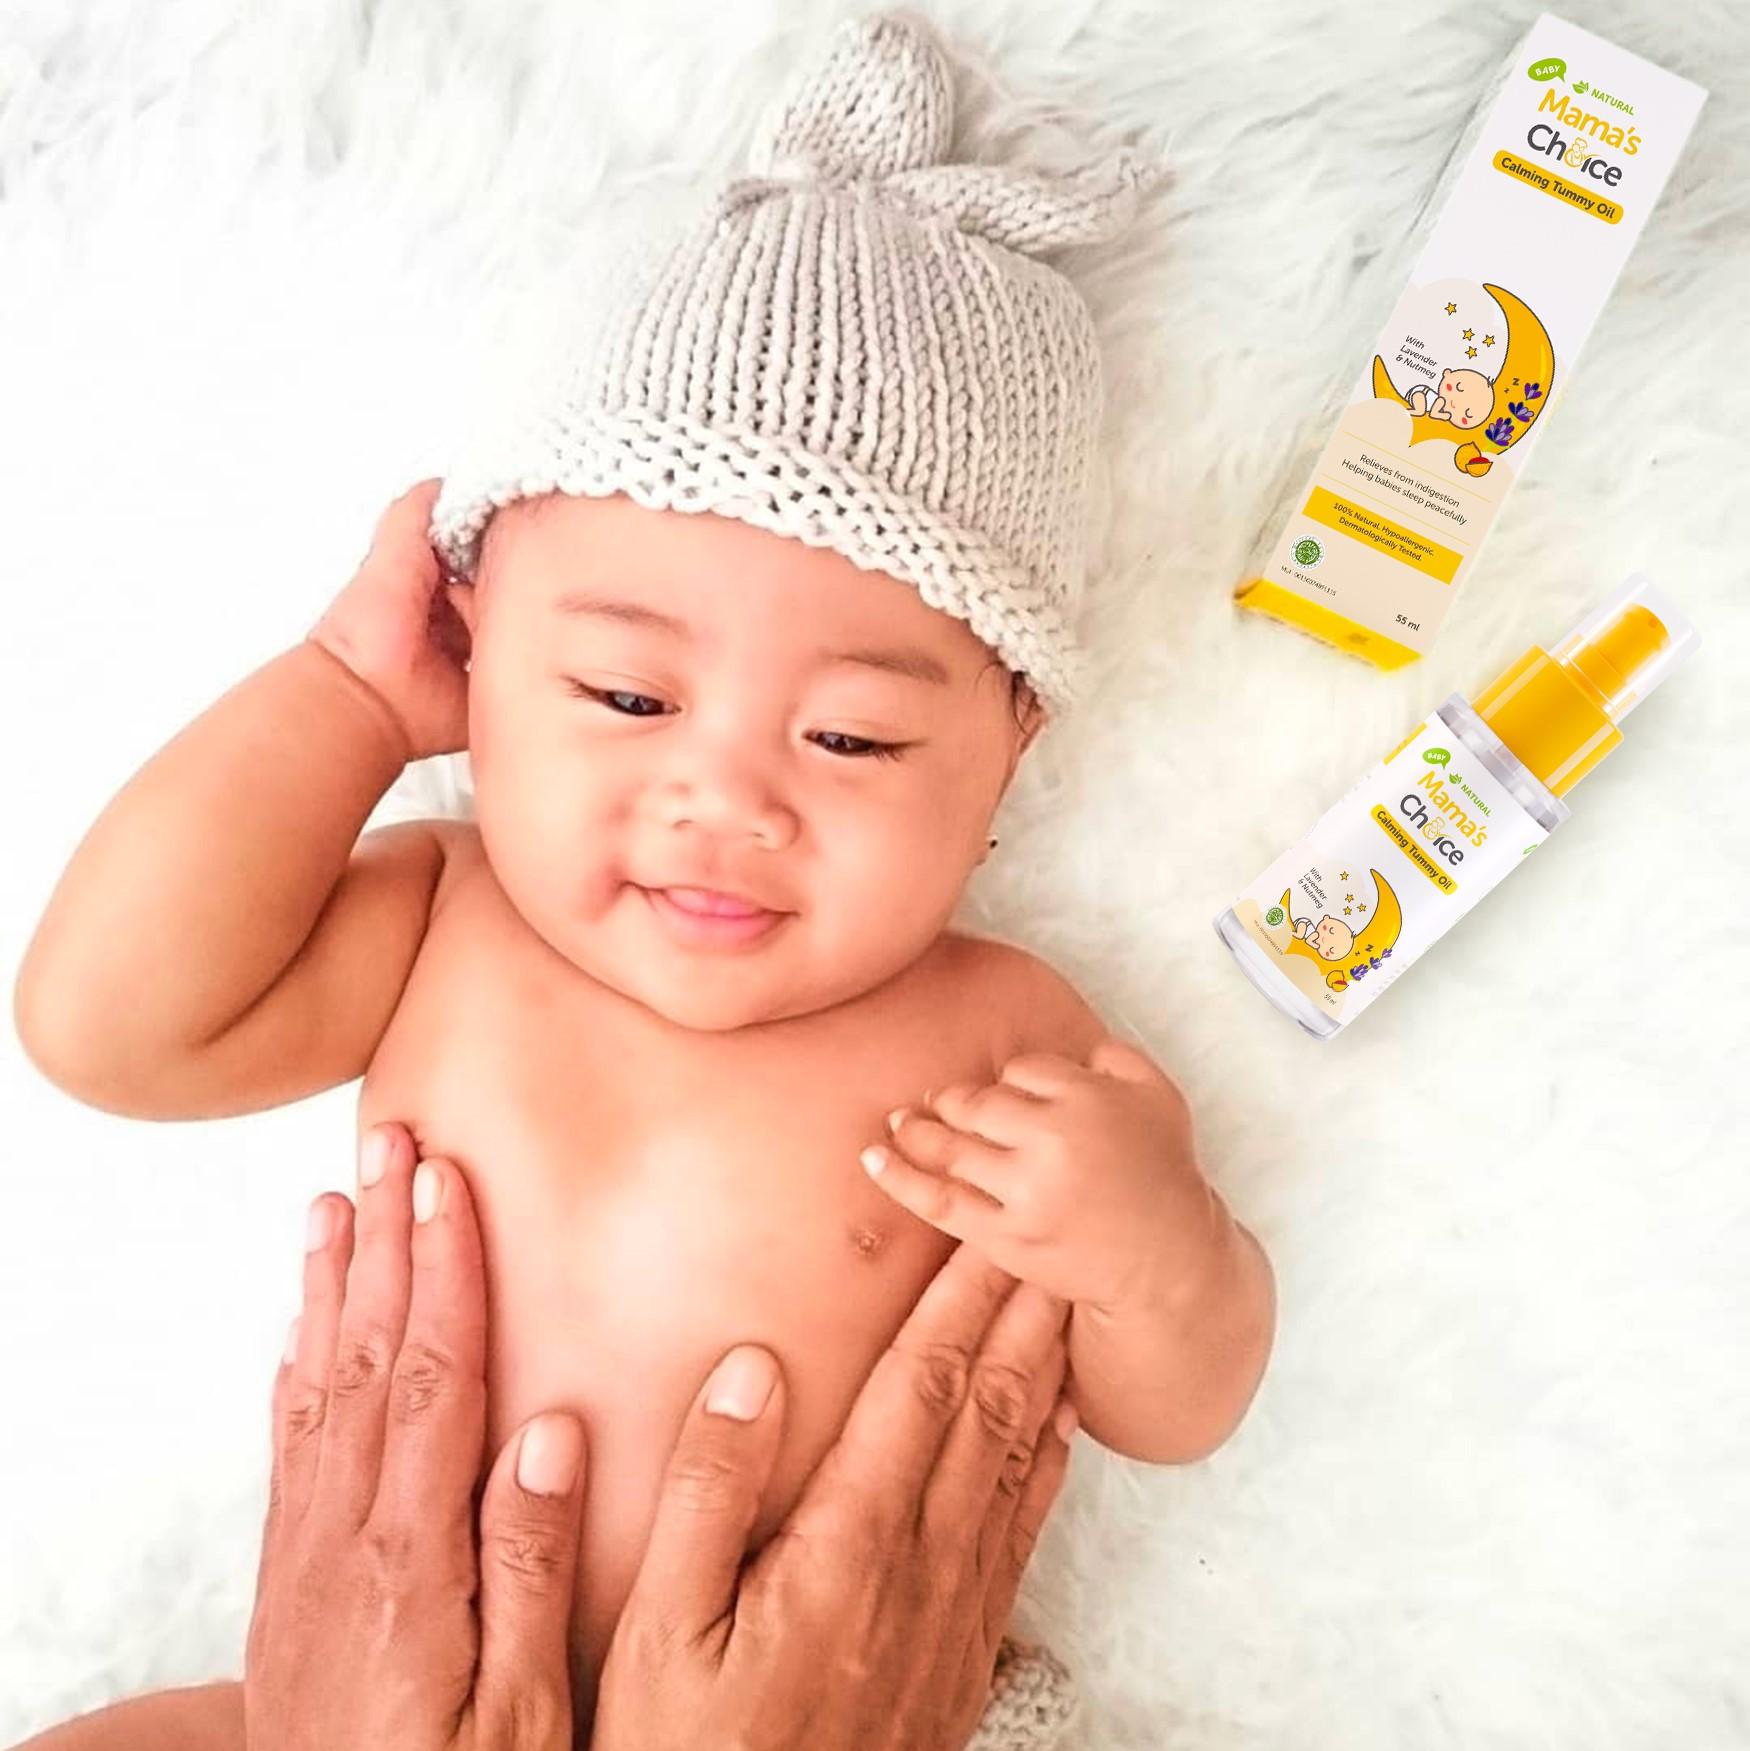 jam tidur bayi, Mama's Choice Baby Calming Tummy Oil, waktu tidur bayi, jam tidur bayi baru lahir